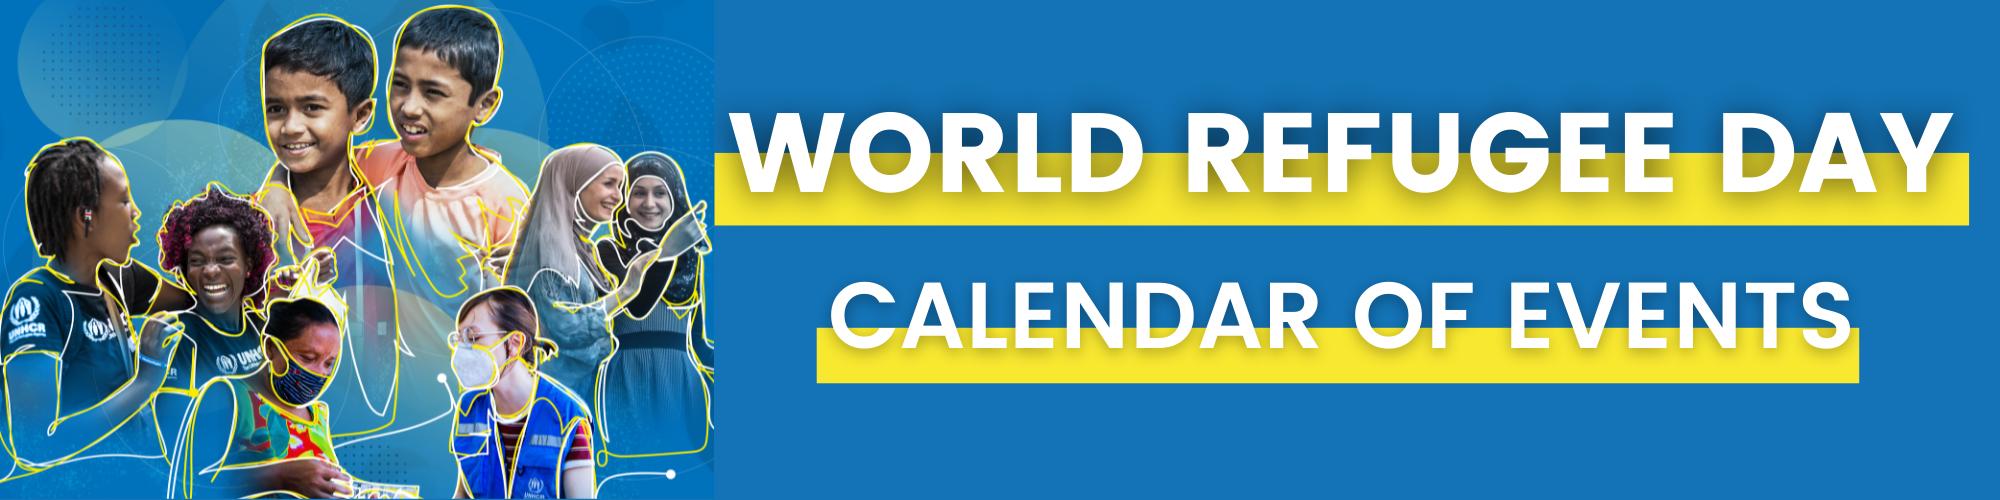 World Refugee Day: Calendar of Events